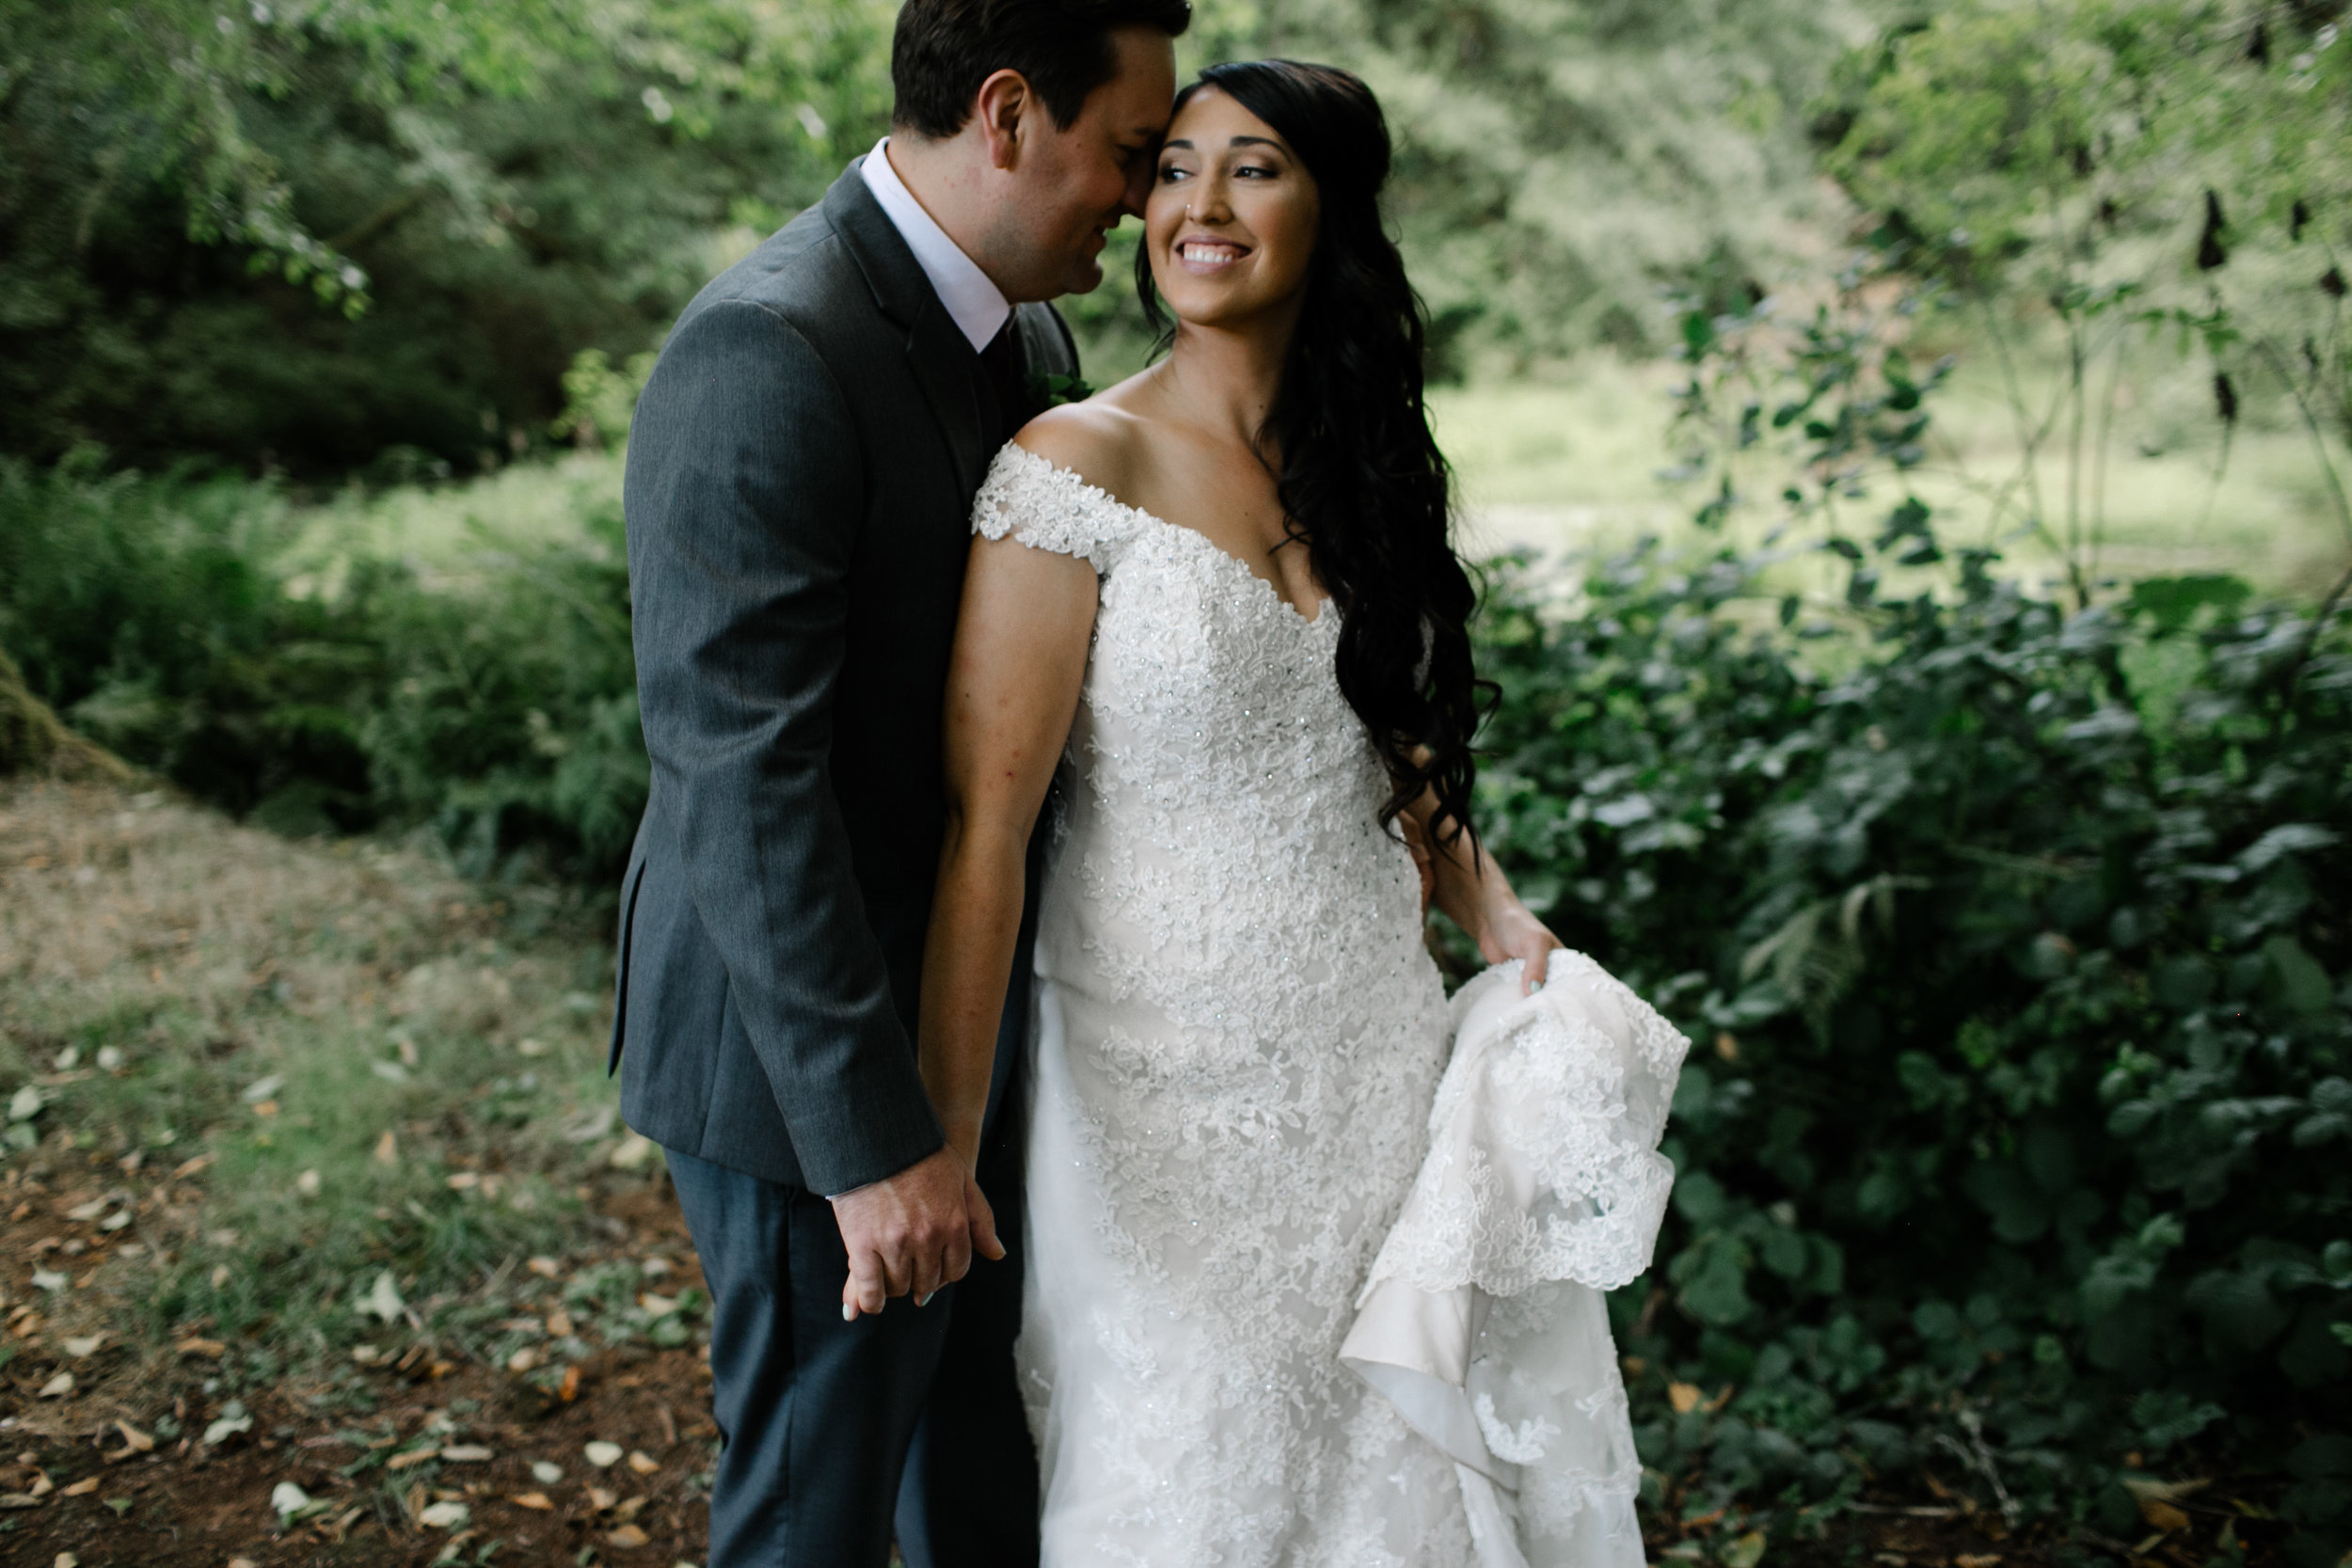 Sevlynn-Photography-Teresa-Chandler-Wedding-24.jpg